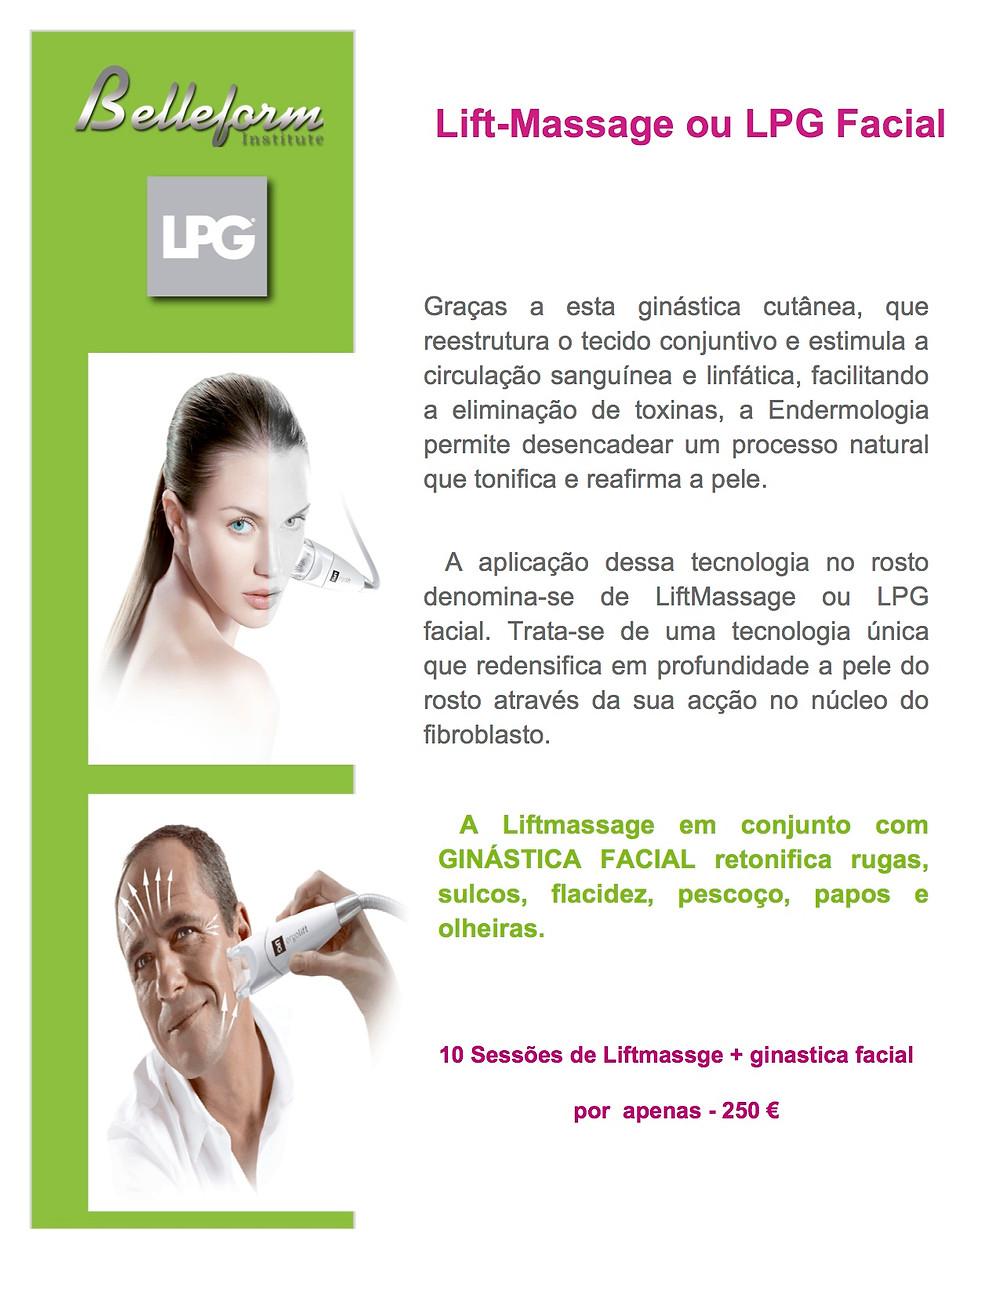 lpg rosto +ginastica 2014-15.jpg